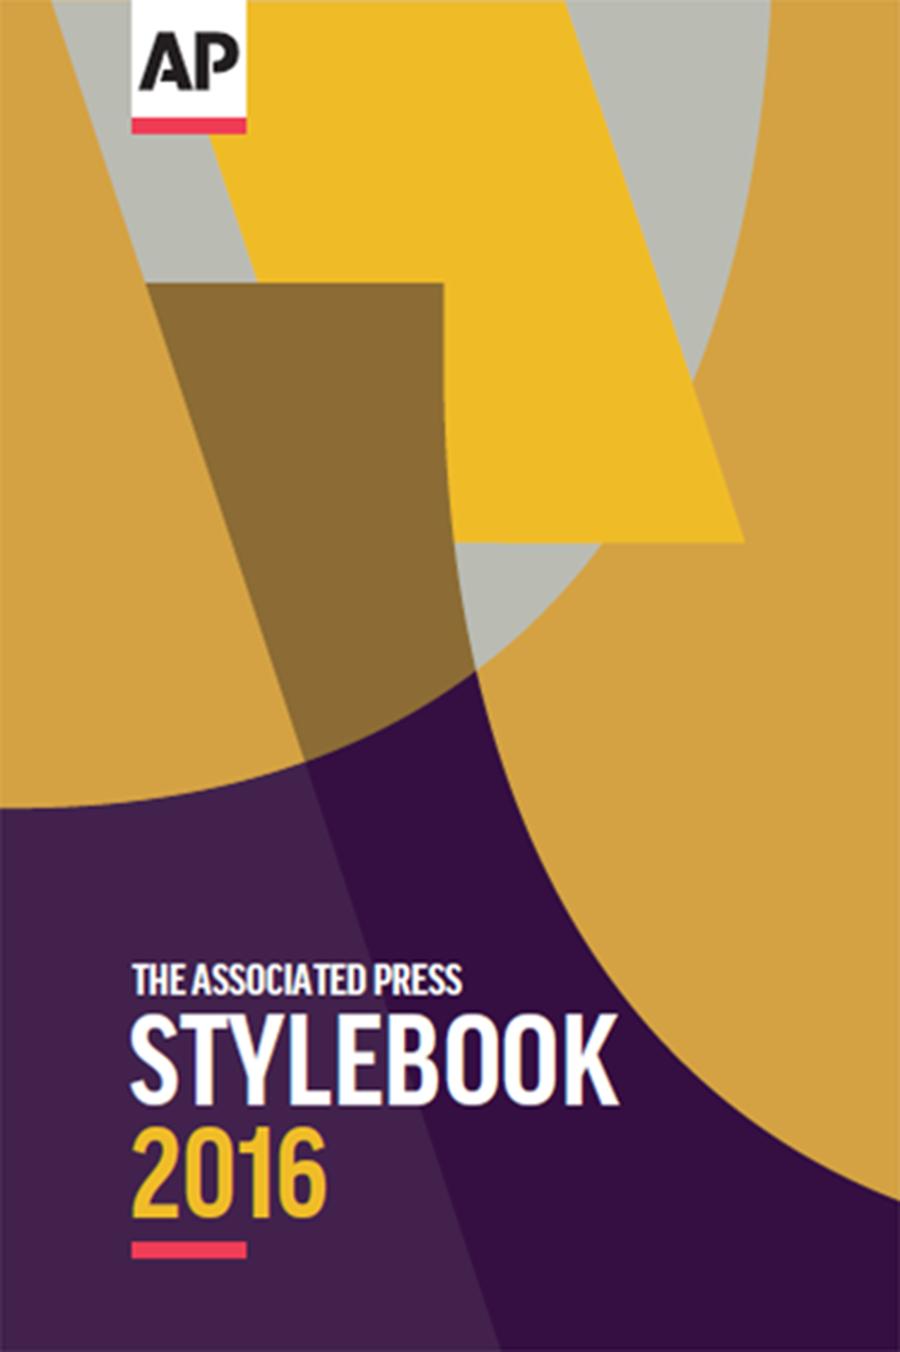 2016 AP Stylebook (print edition)